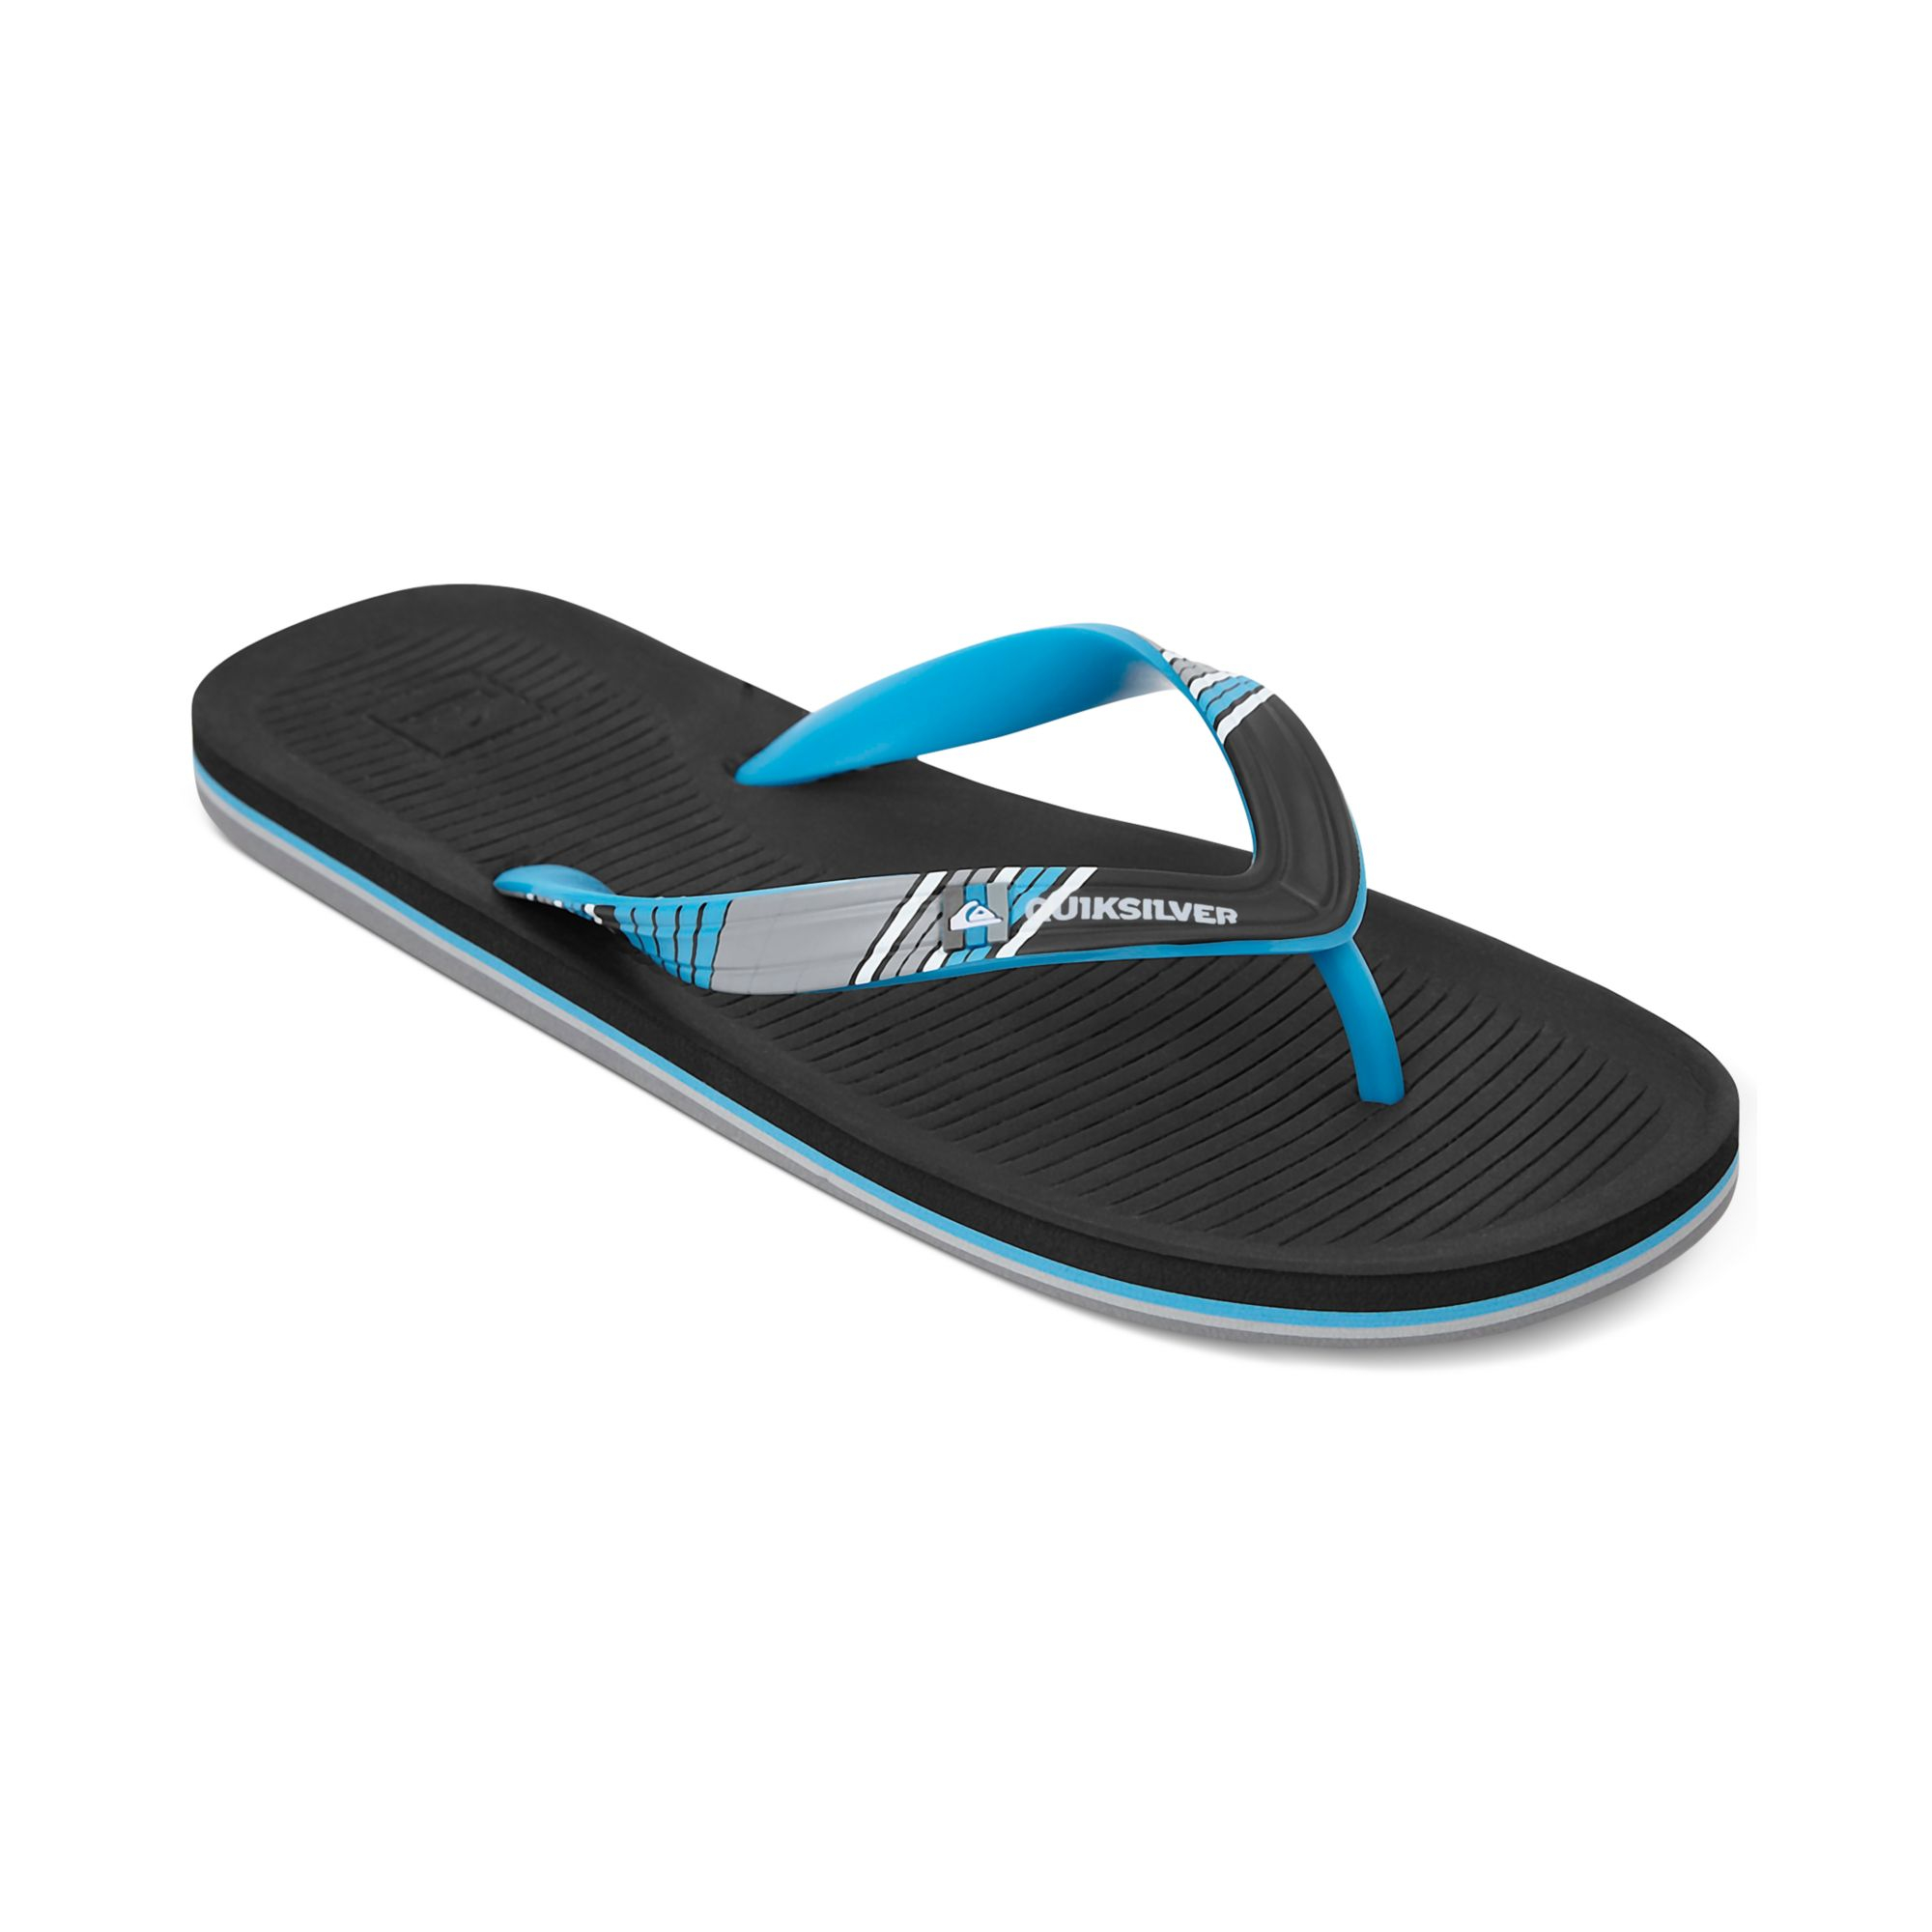 1432f524615 Lyst - Quiksilver Haleiwa Print Sandals in Blue for Men